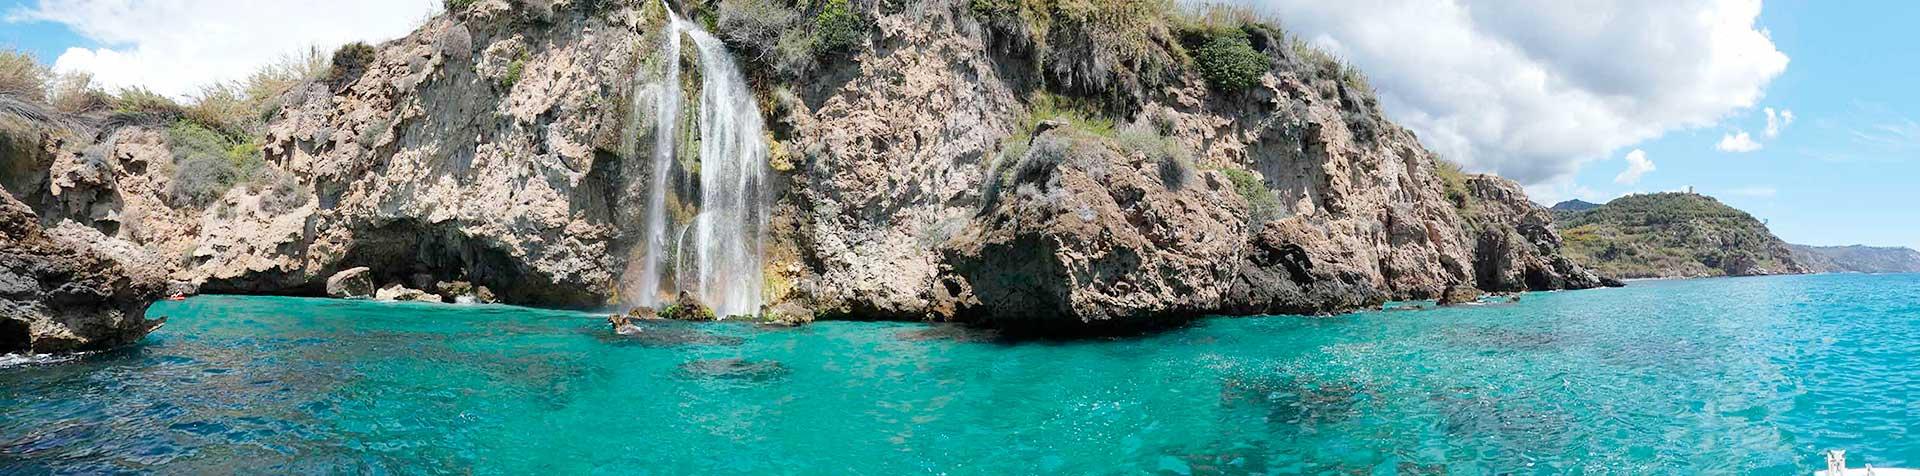 Sightseeing Boat Trip Malaga